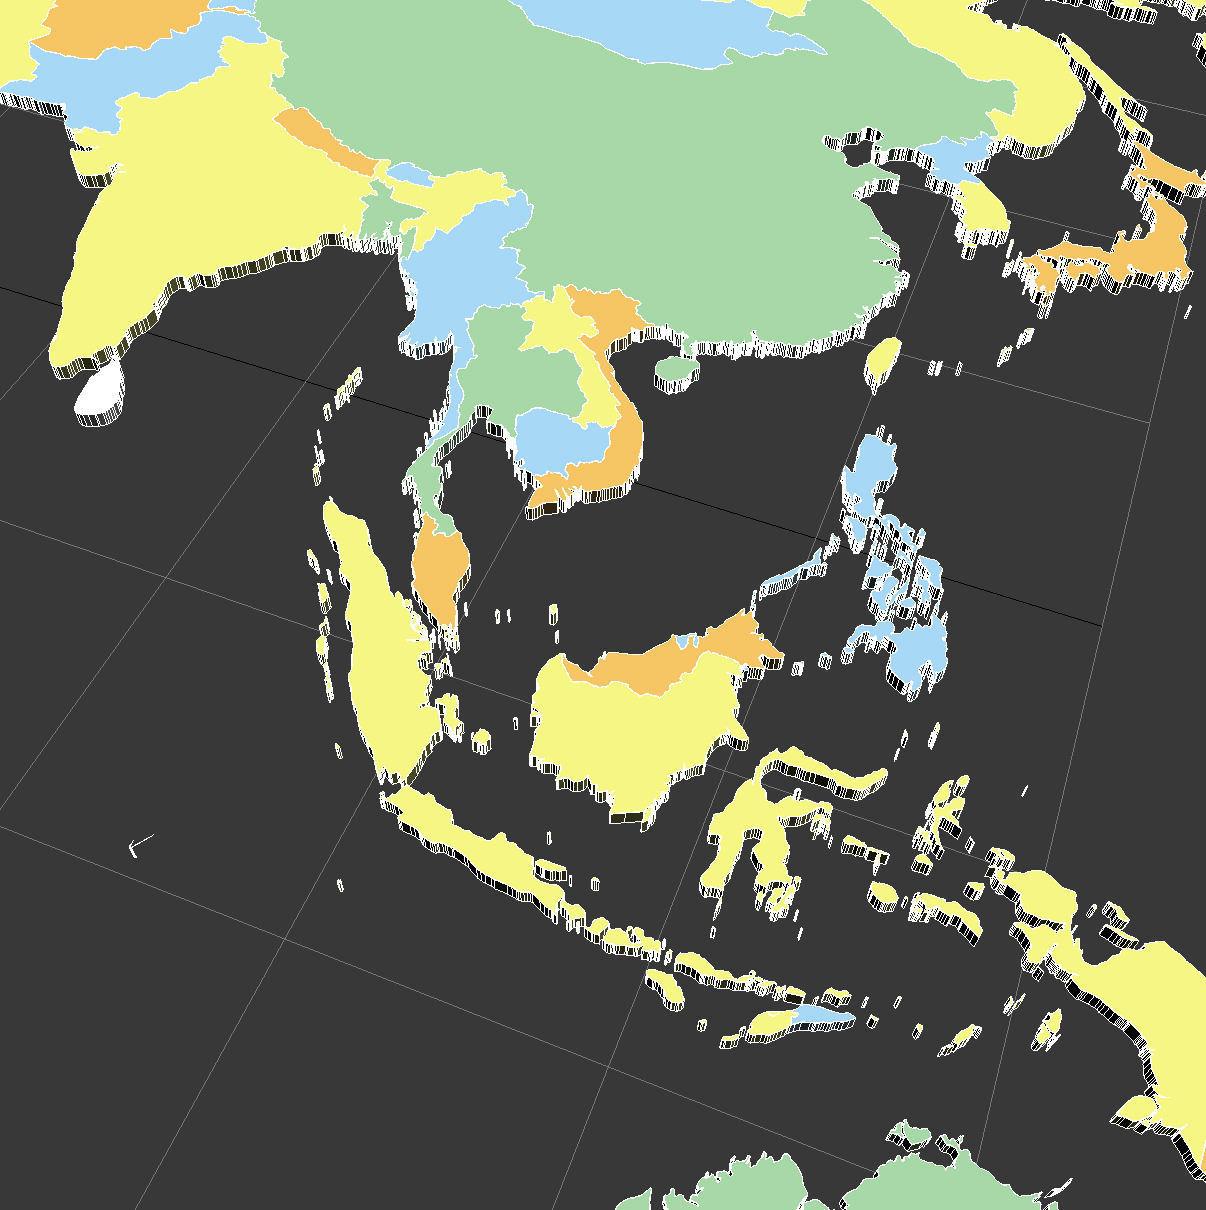 3d political world map cgtrader political world map 3d model max obj 3ds mtl tga 10 gumiabroncs Images